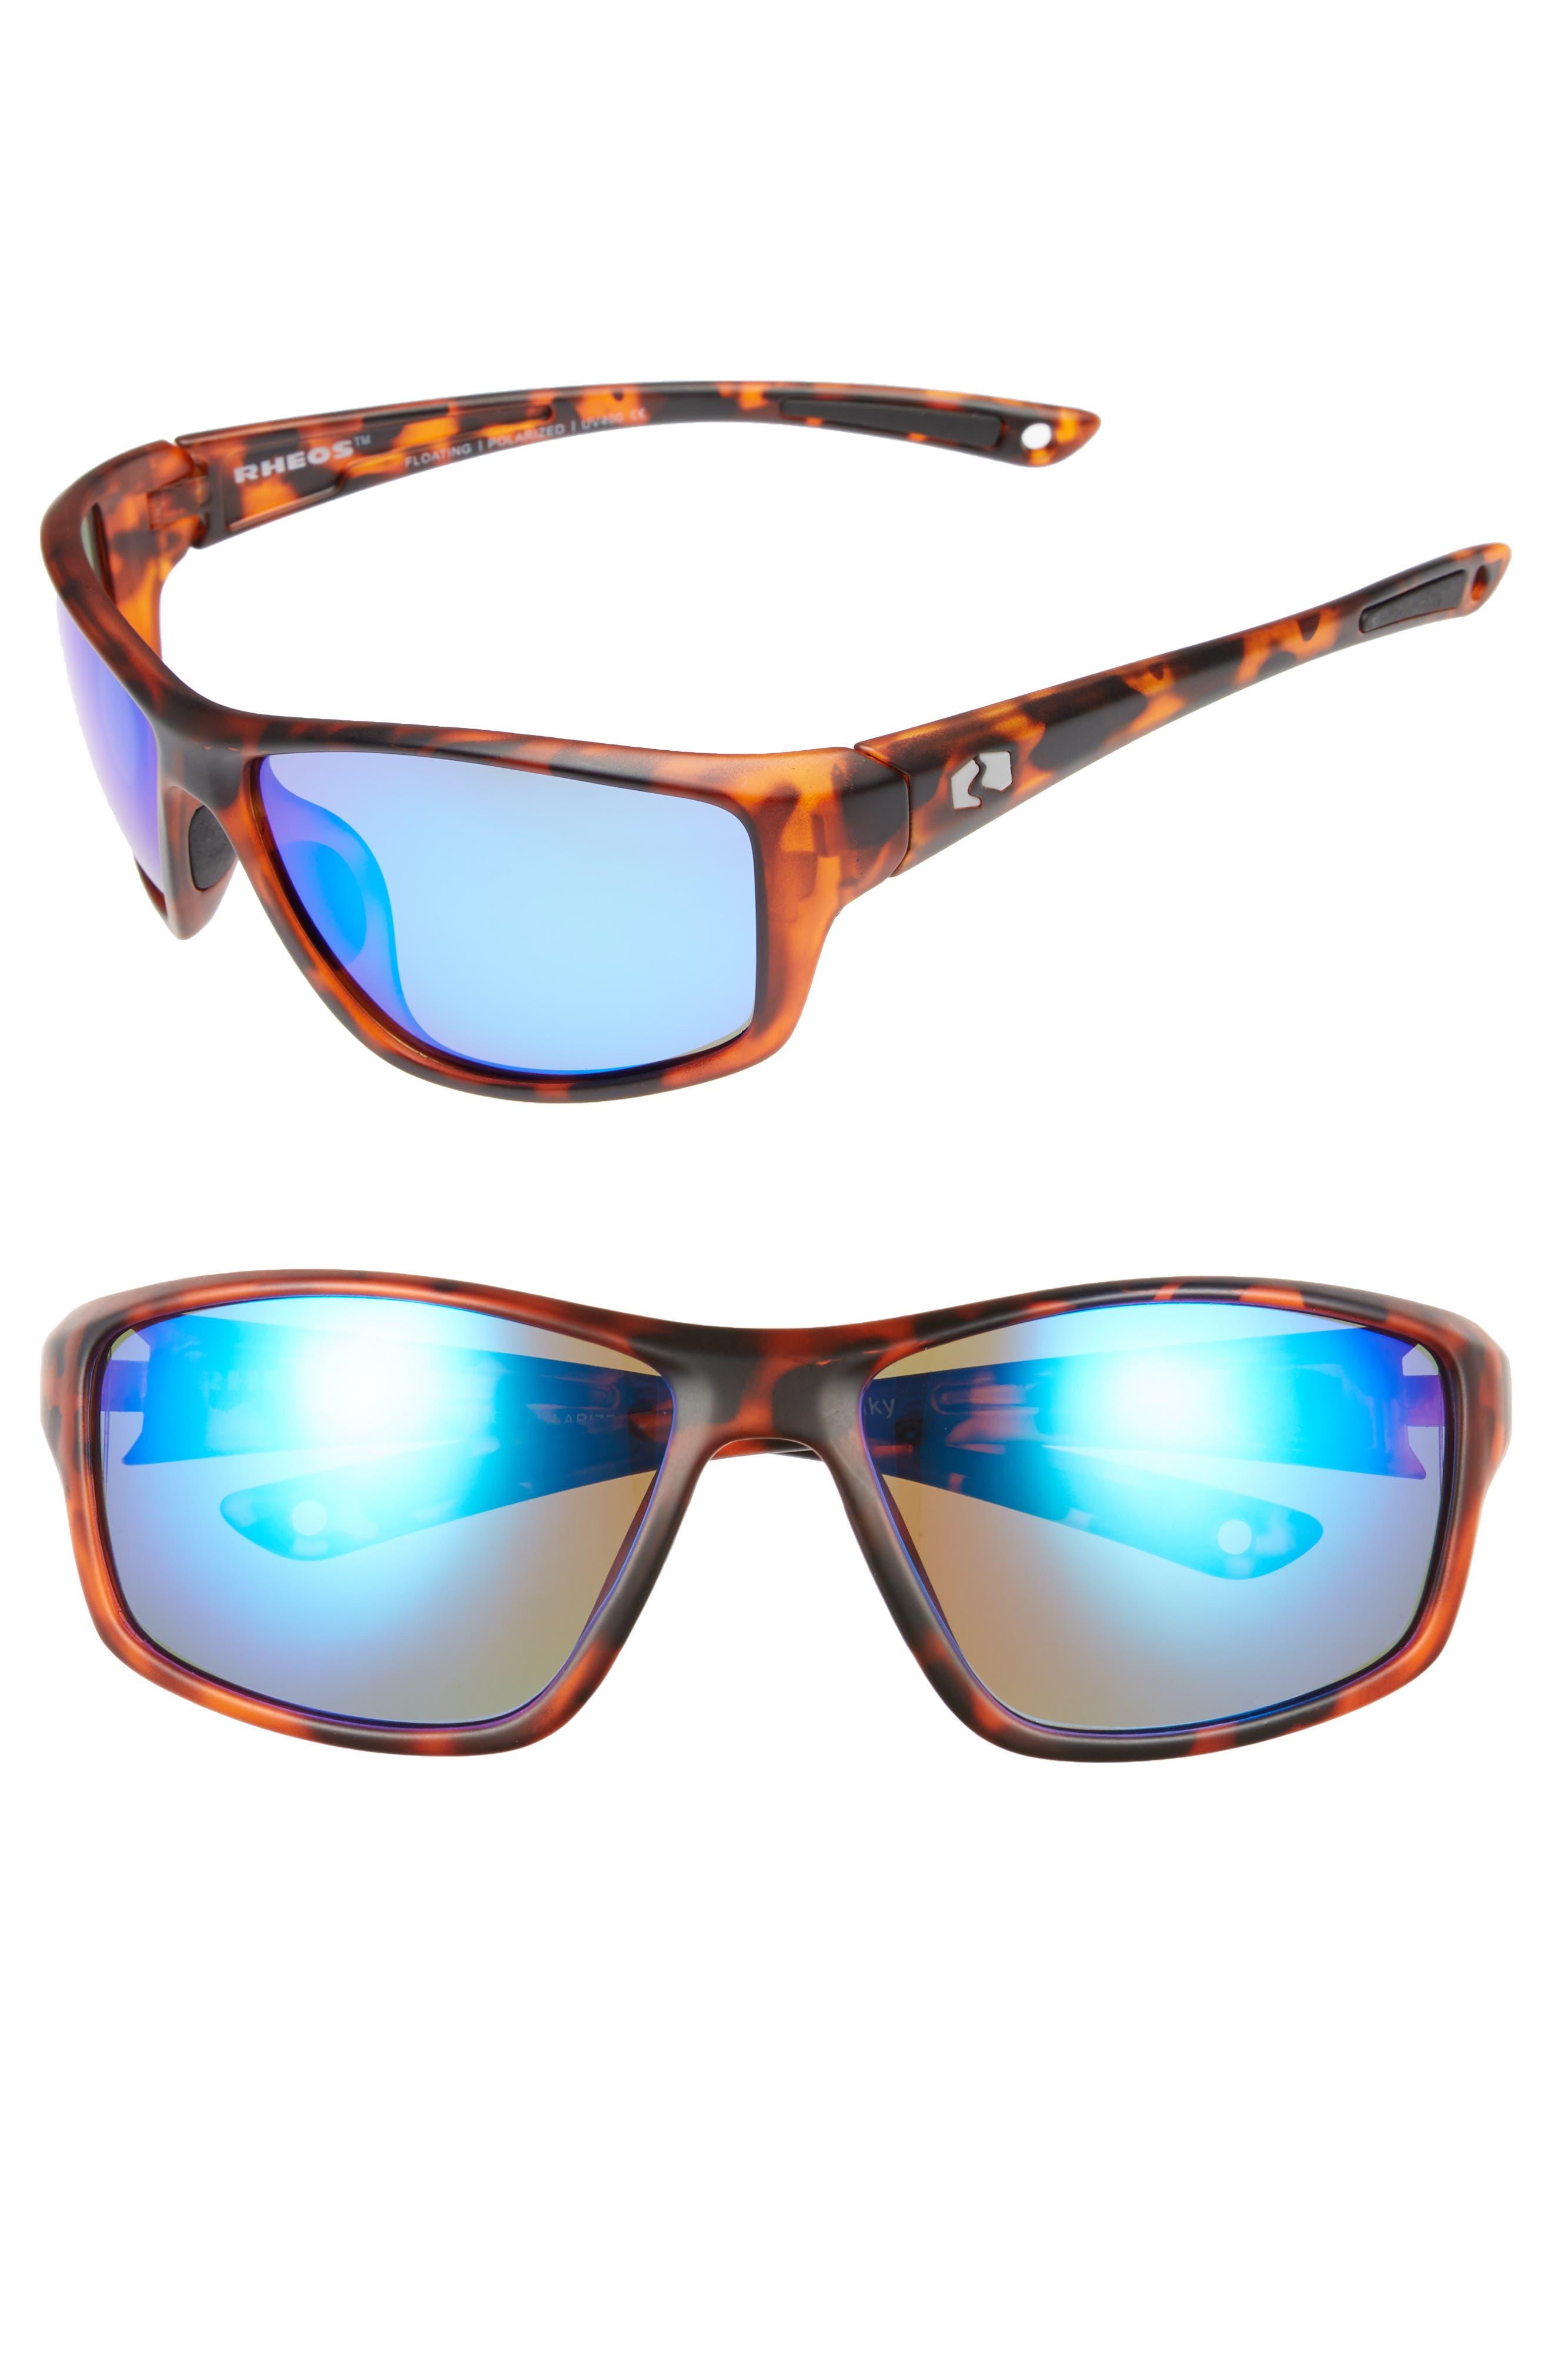 Eddies Floating 58mm Polarized Sunglasses,                             Main thumbnail 1, color,                             Tortoise / Marine